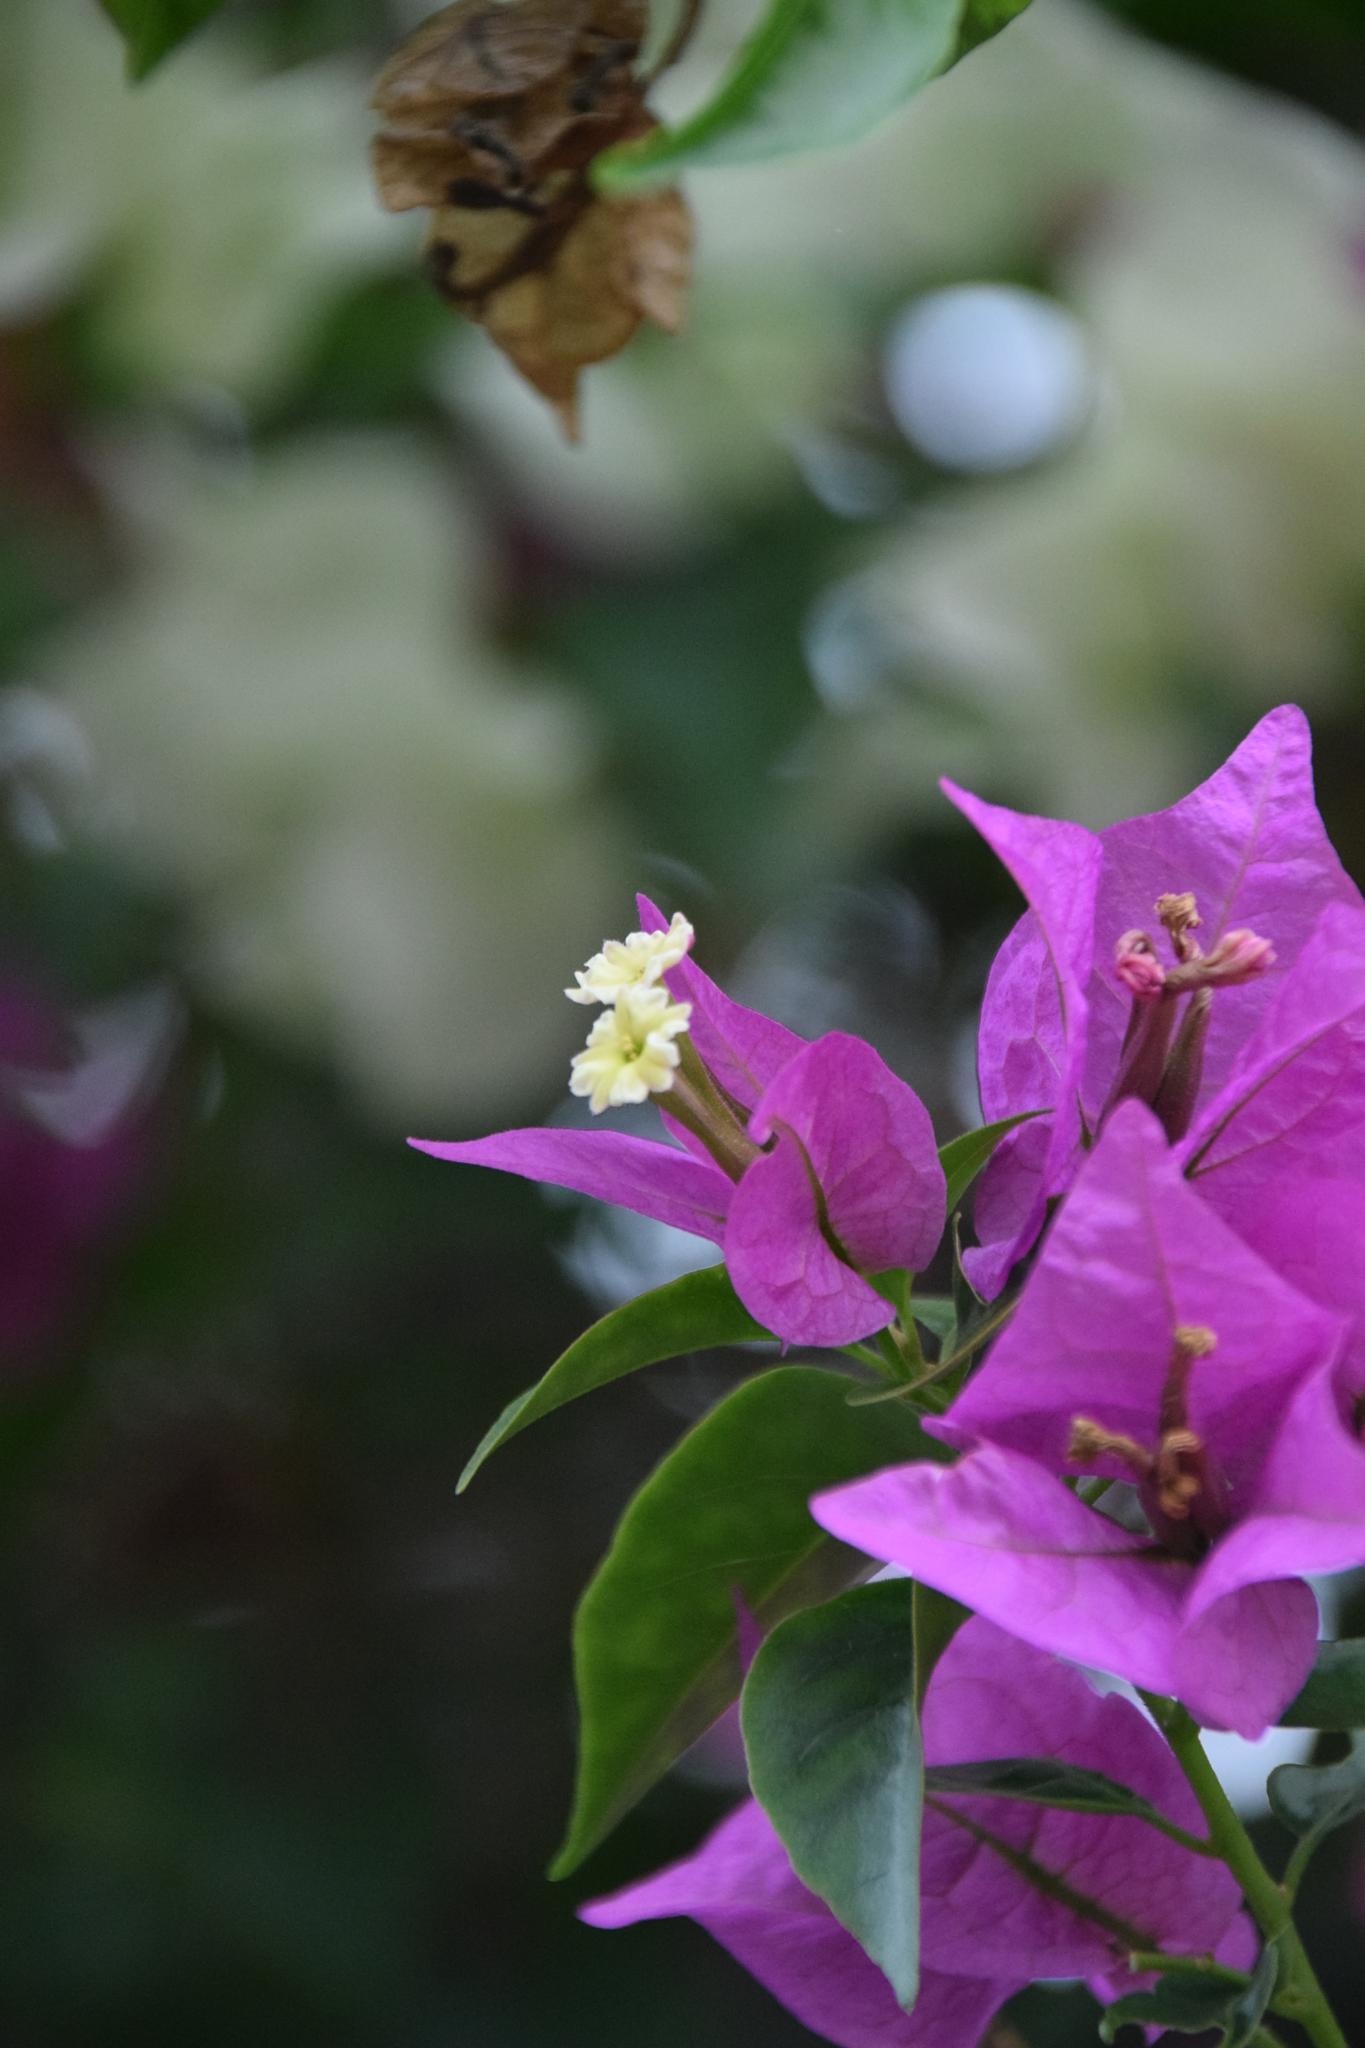 Bouganvilia in bloom by Sophia von Wrangell